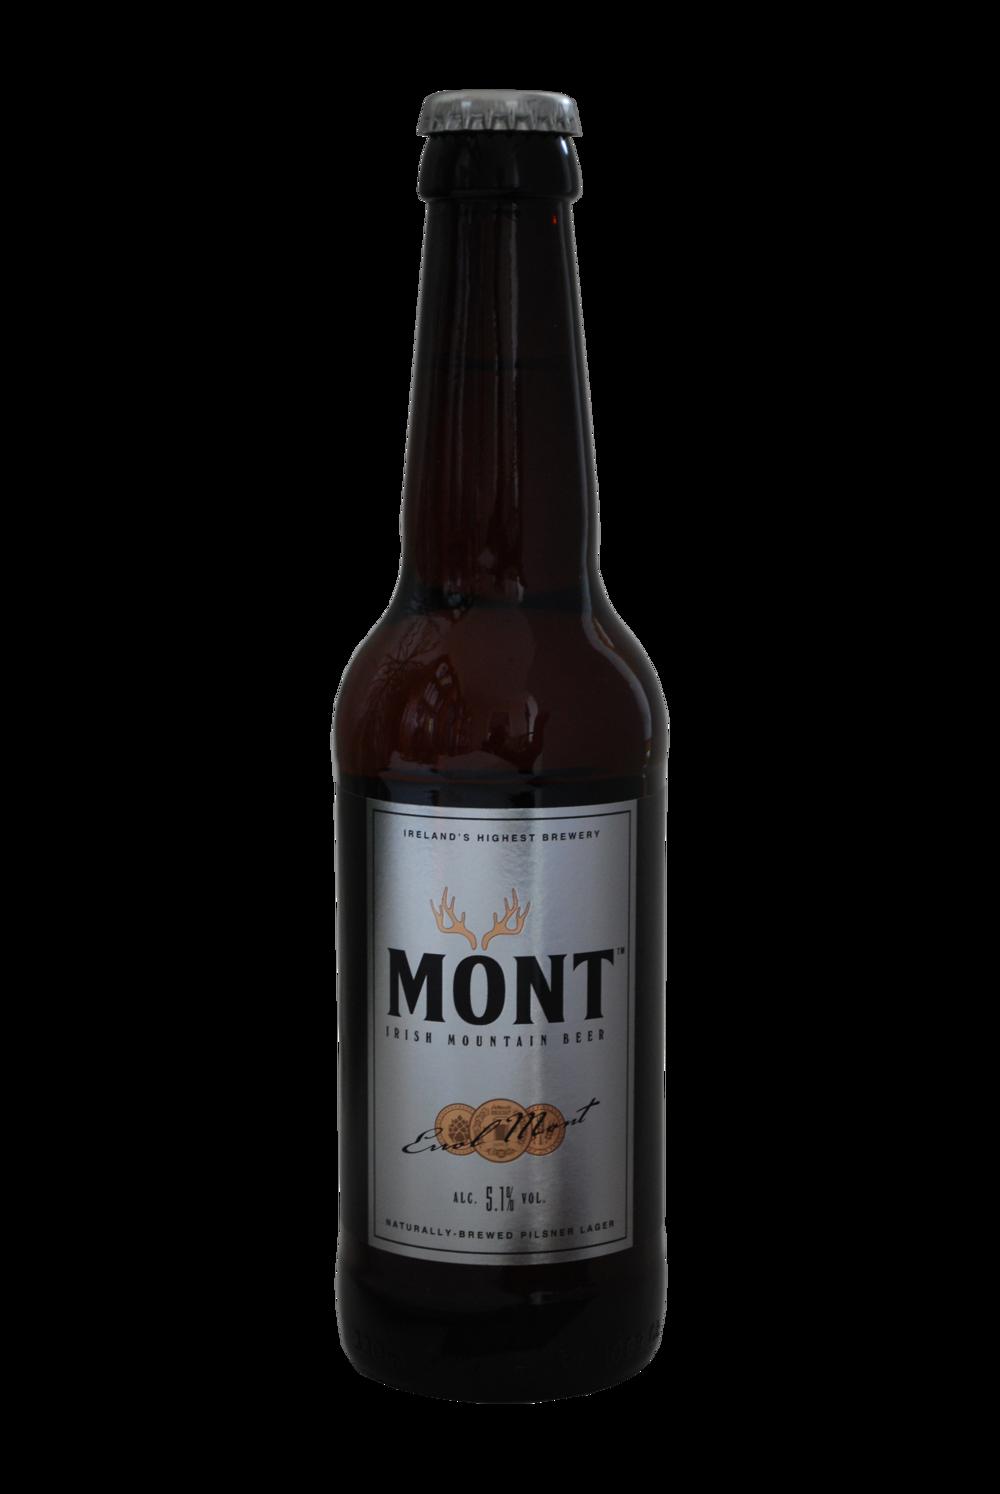 MONT Irish Mountain Beer 330ml bottle.png